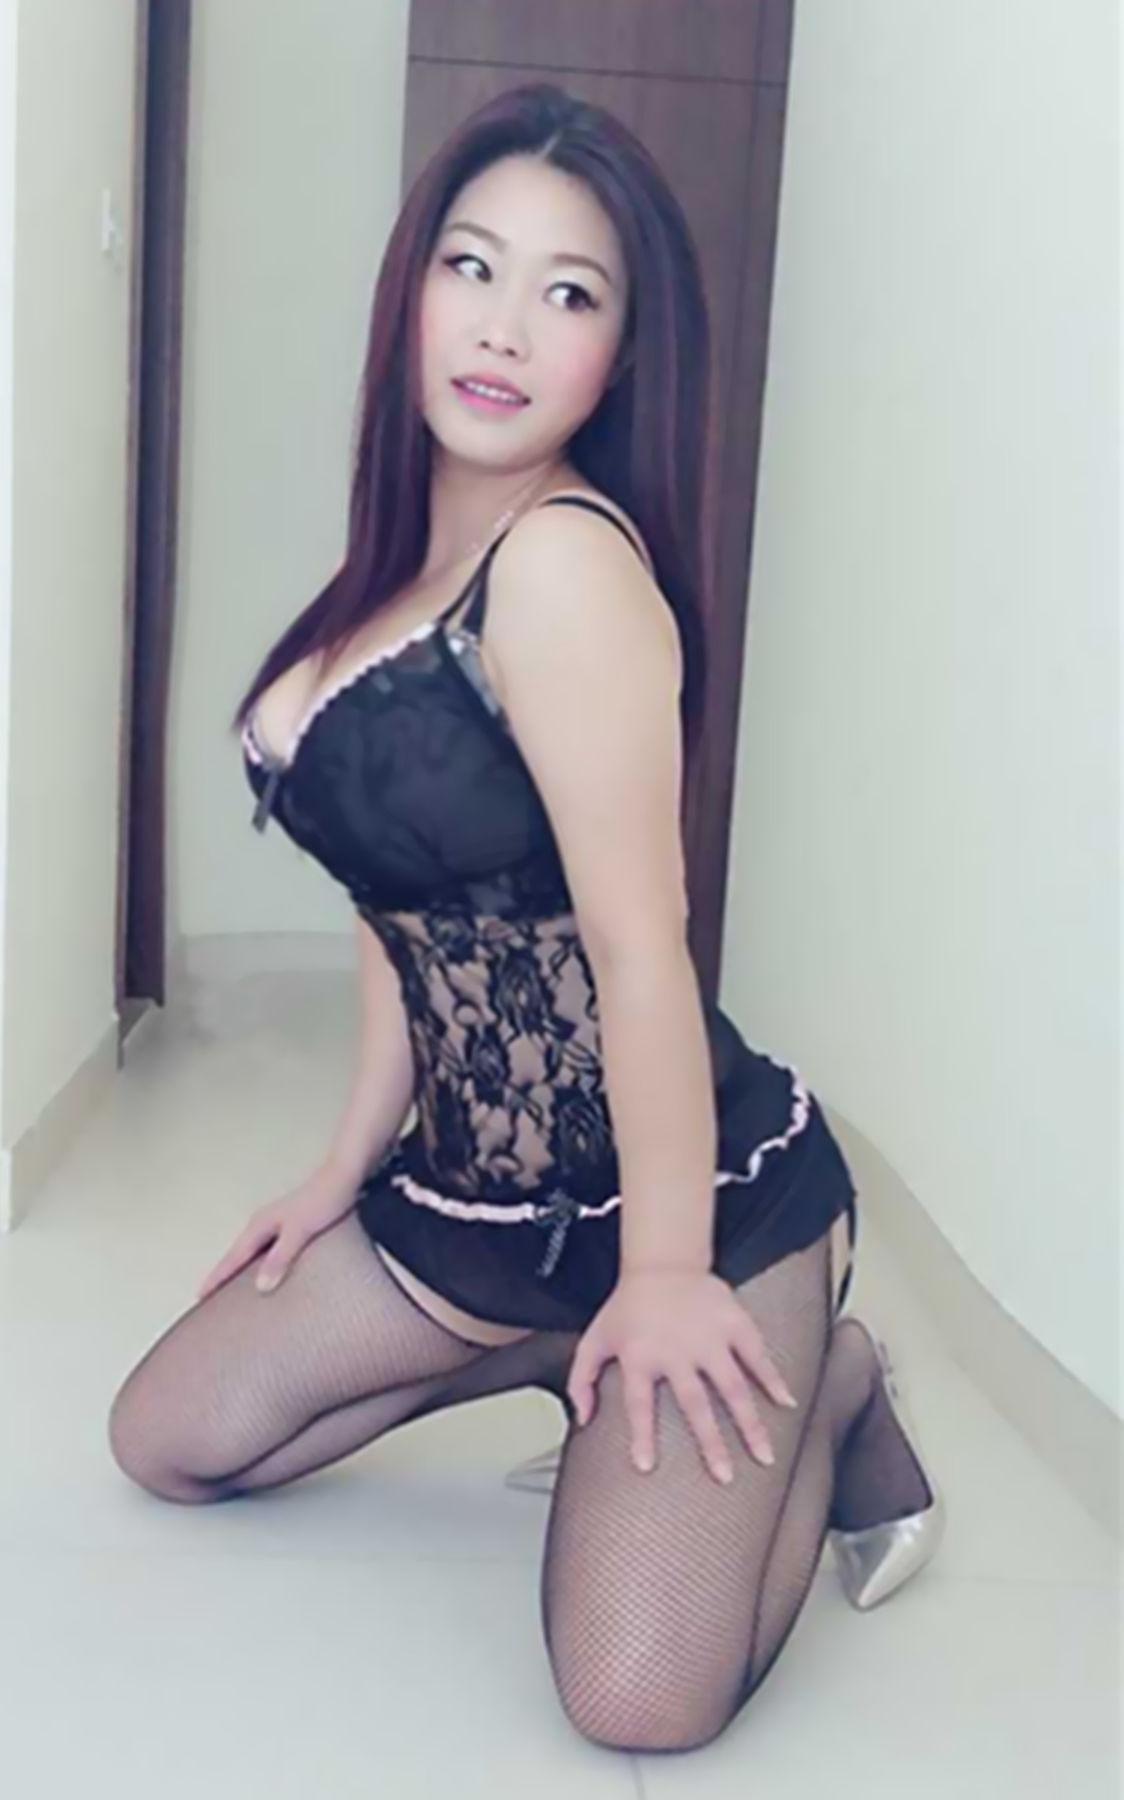 real nuru massage escort girl online